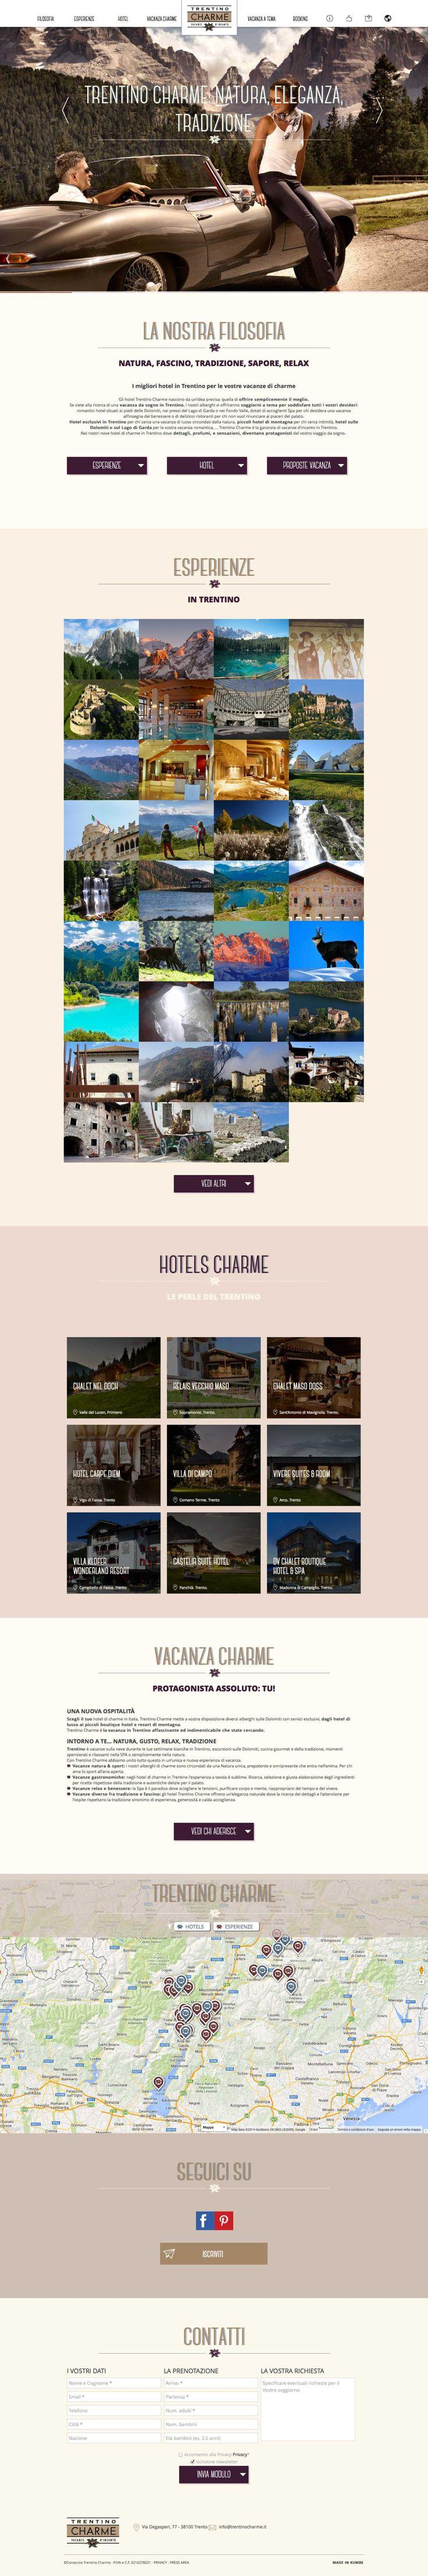 #trentinocharme www.trentinocharme.it #Kumbe #portfolioweb #webdesign #website #responsivedesign #responsive #restyling #newlook #hotels #charme #trentino #beautiful #beauty #sunset #fun #family #love #romance #goodtime #wedding #party #food #fashion #style #jewels #dolomiti #vacanzacharme #vacanzaatema #holiday #natura #fascino #tradizione #sapore #relax #lagodigarda #gardasee #vacanzaromantica #esperienze